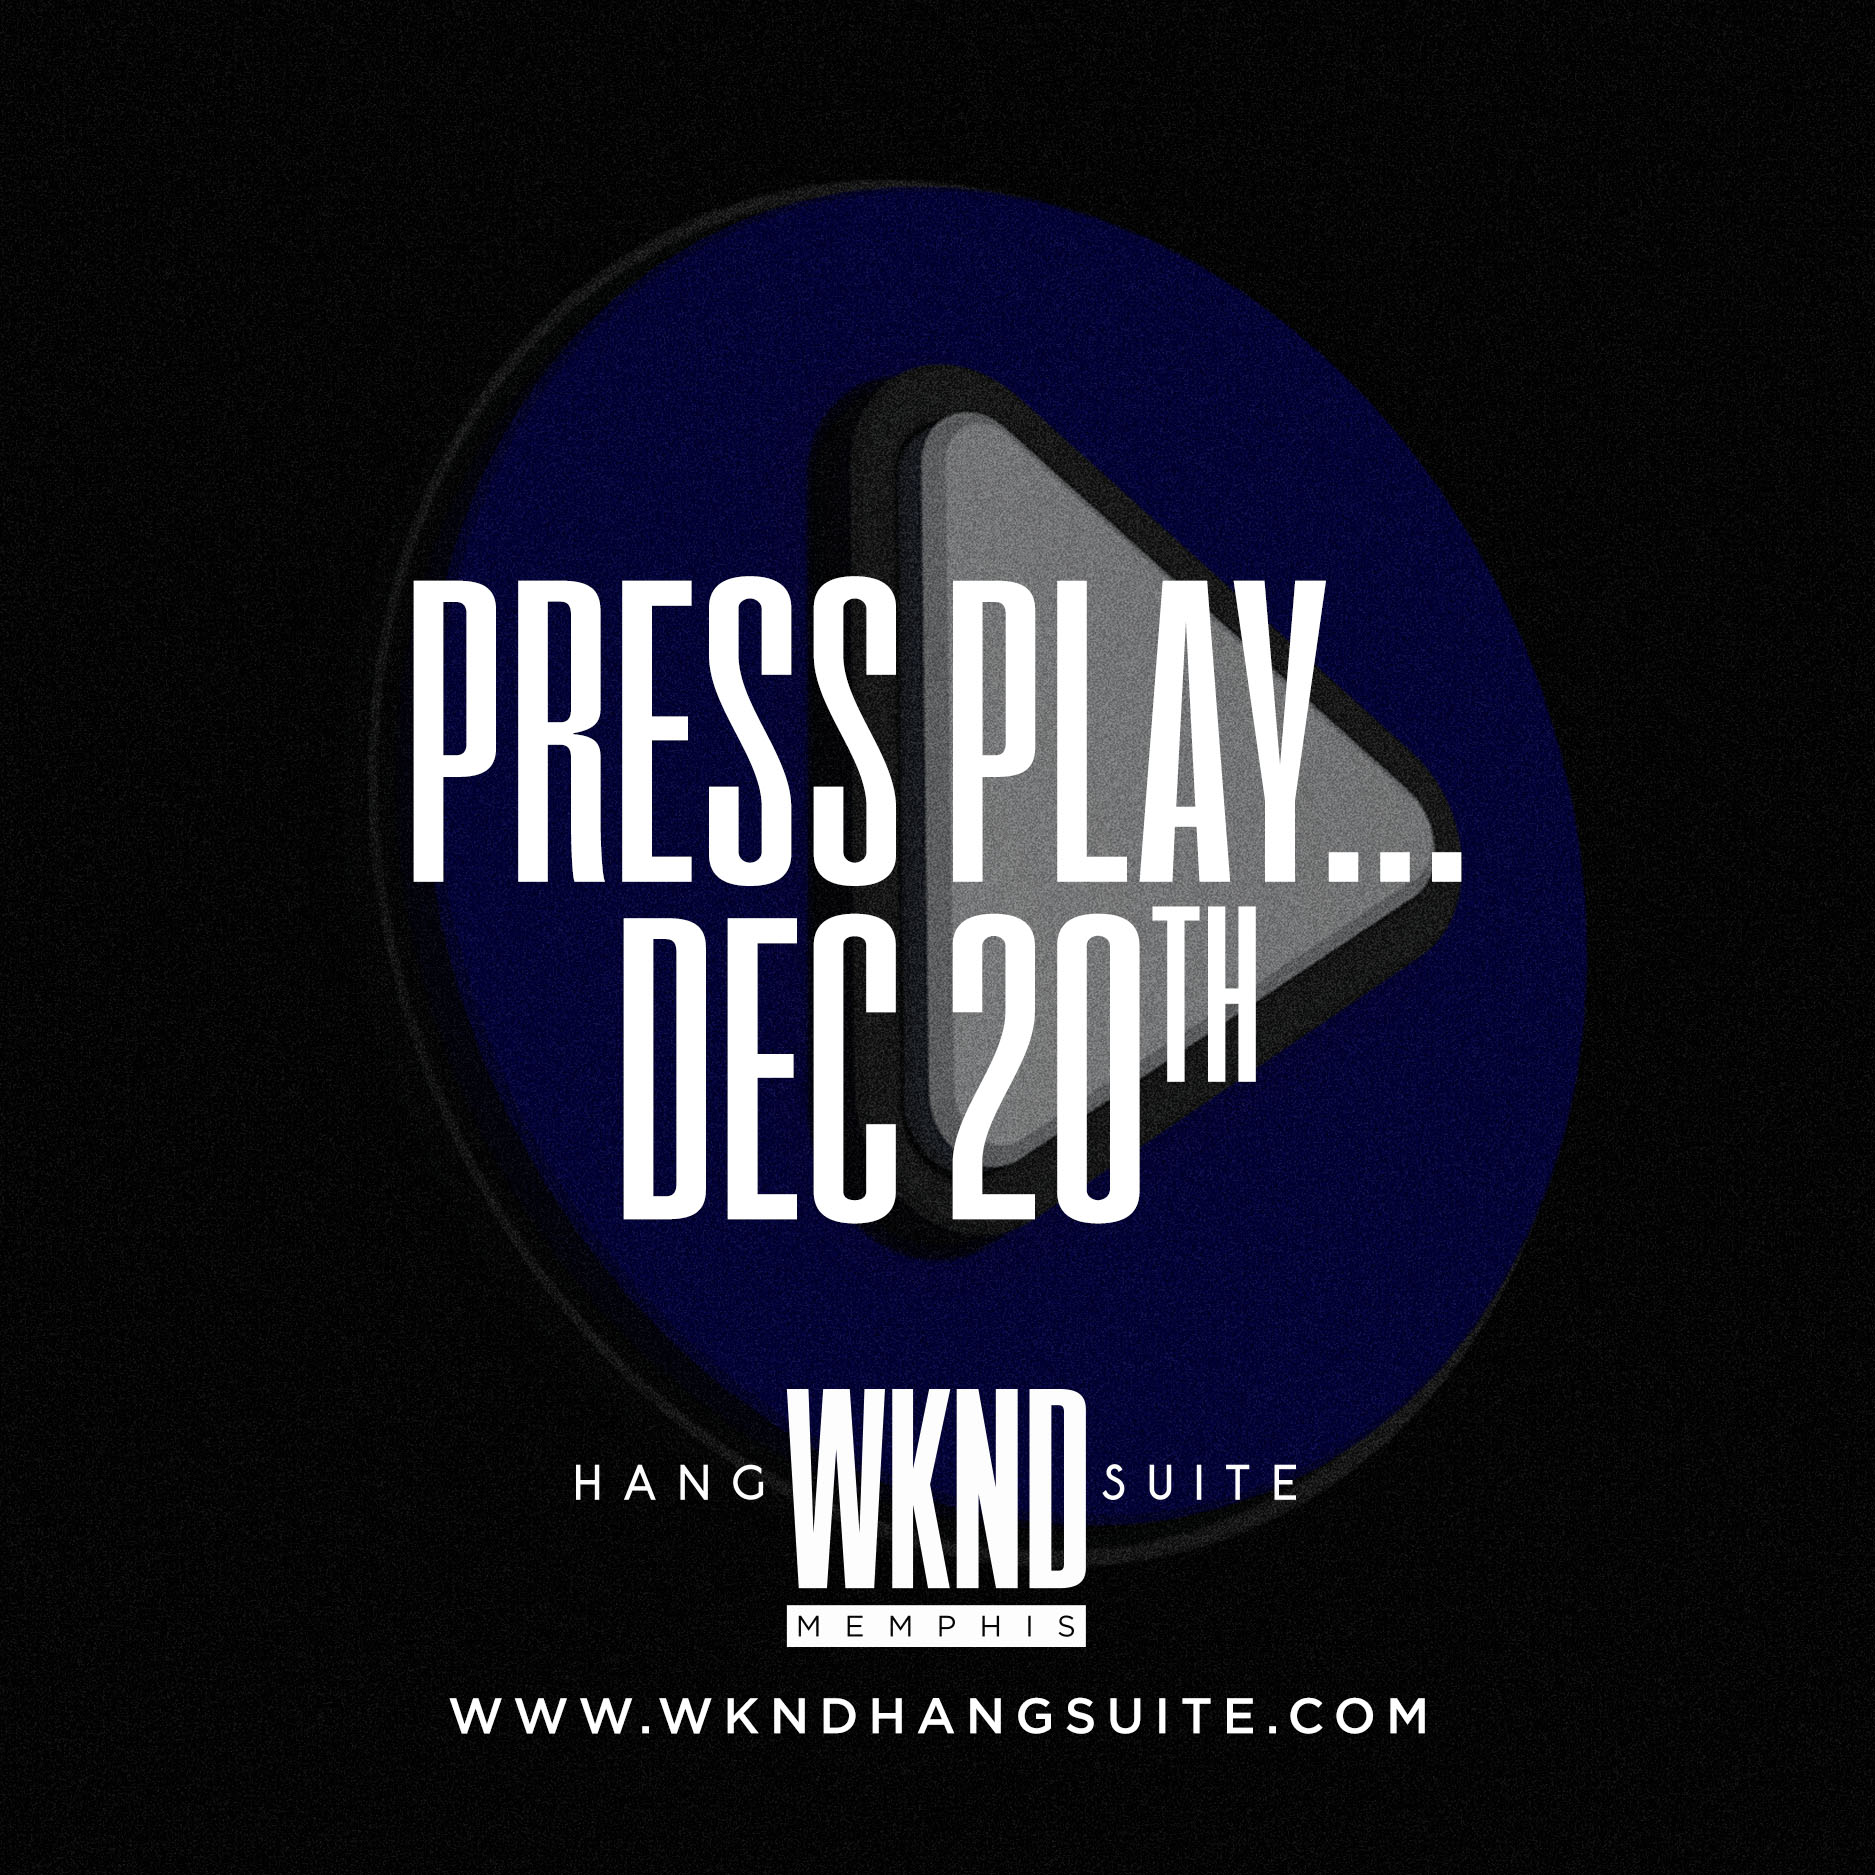 WKND_Creative_PressPlay.jpg